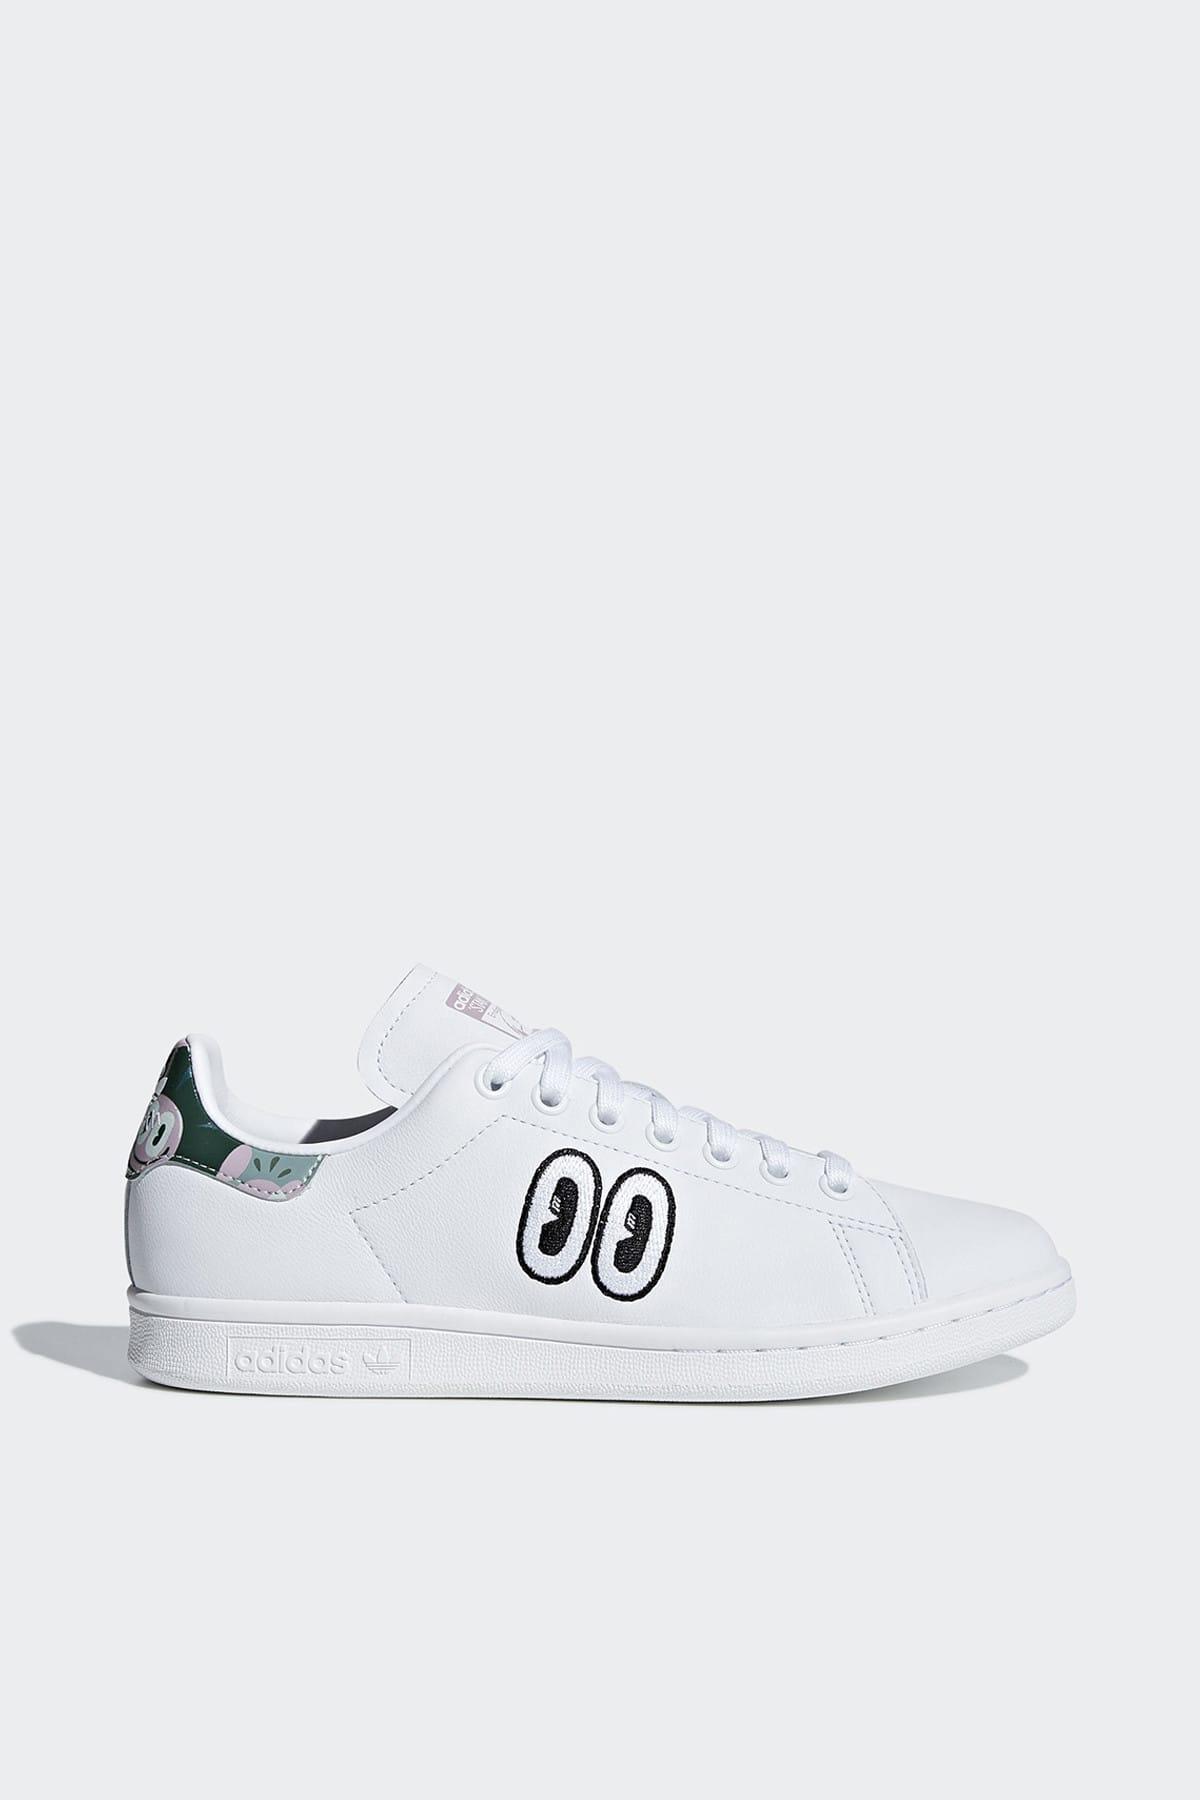 adidas Kadın Originals Spor Ayakkabı - Stan Smith W - CM8415 1